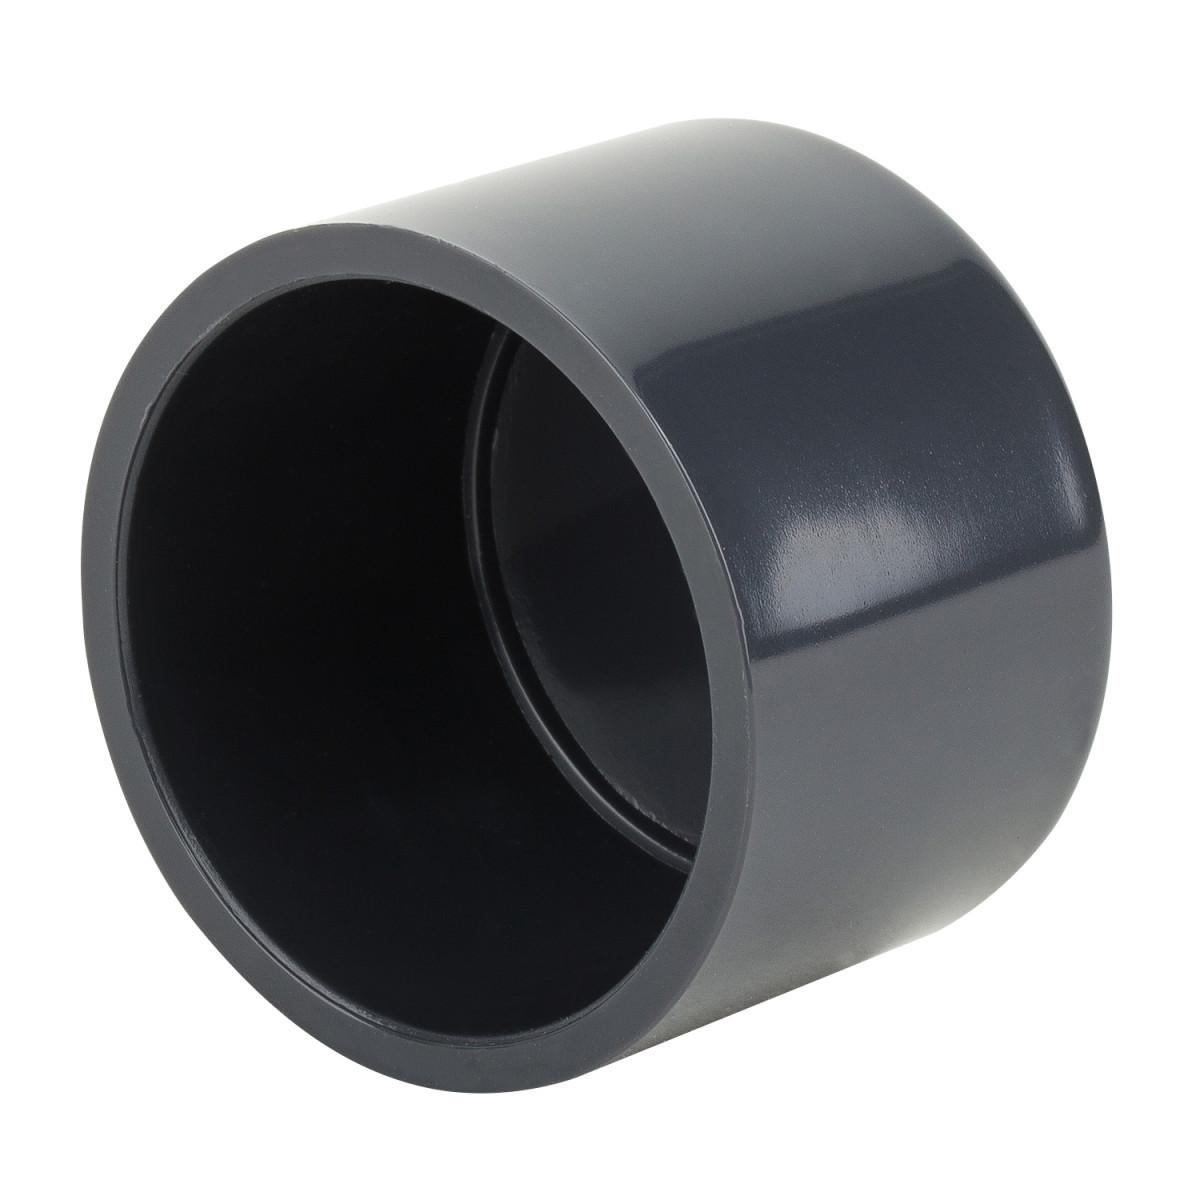 Заглушка ПВХ ERA клеевая, диаметр 125 мм.